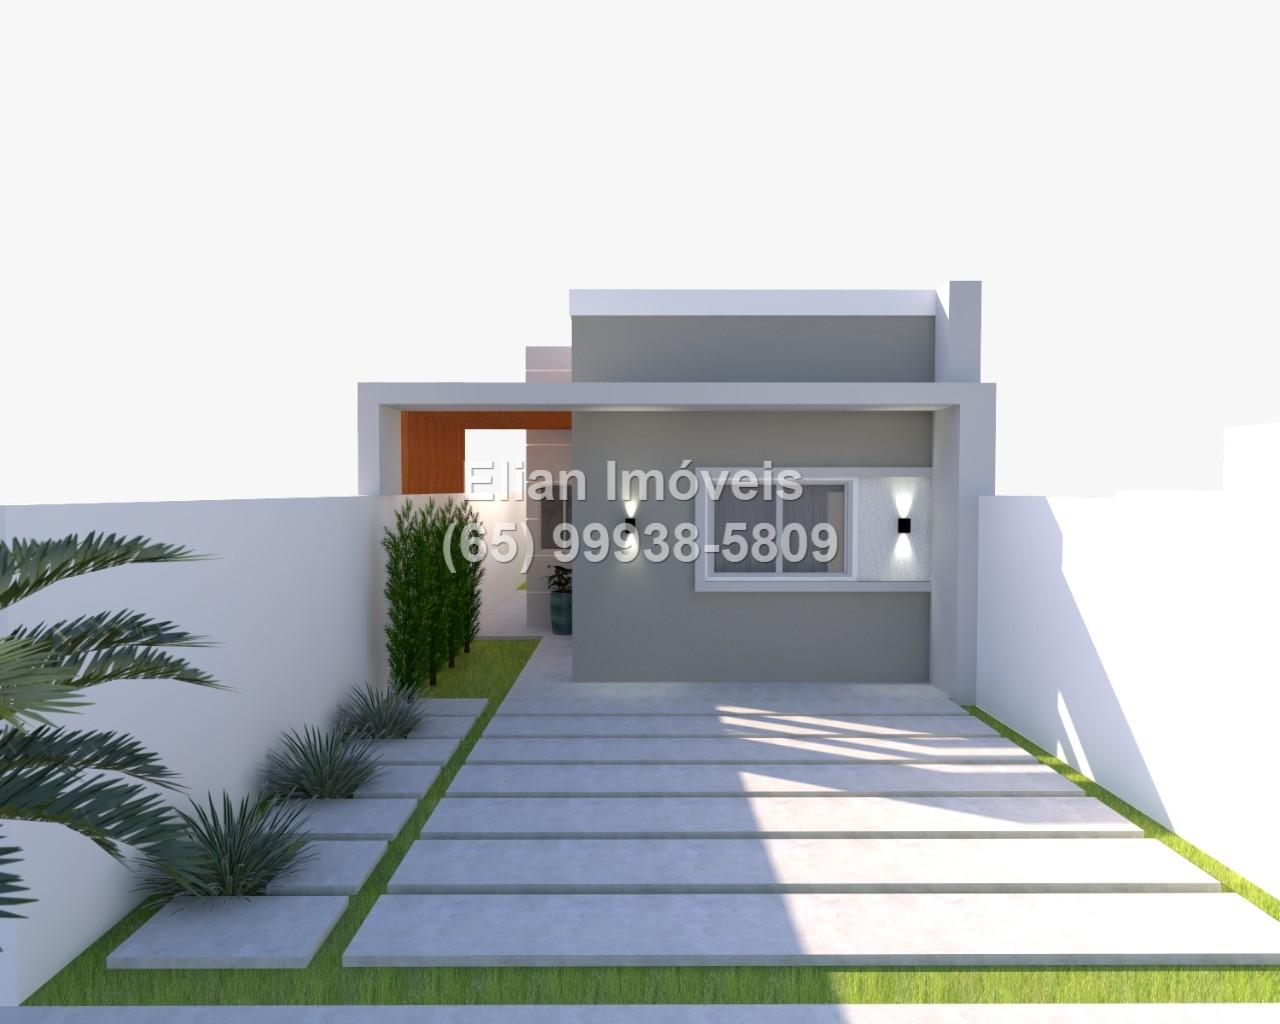 Casa Cond. Fechado  com 3 quartos sendo 1 Suíte no Santa Cruz, Cuiabá  - MT